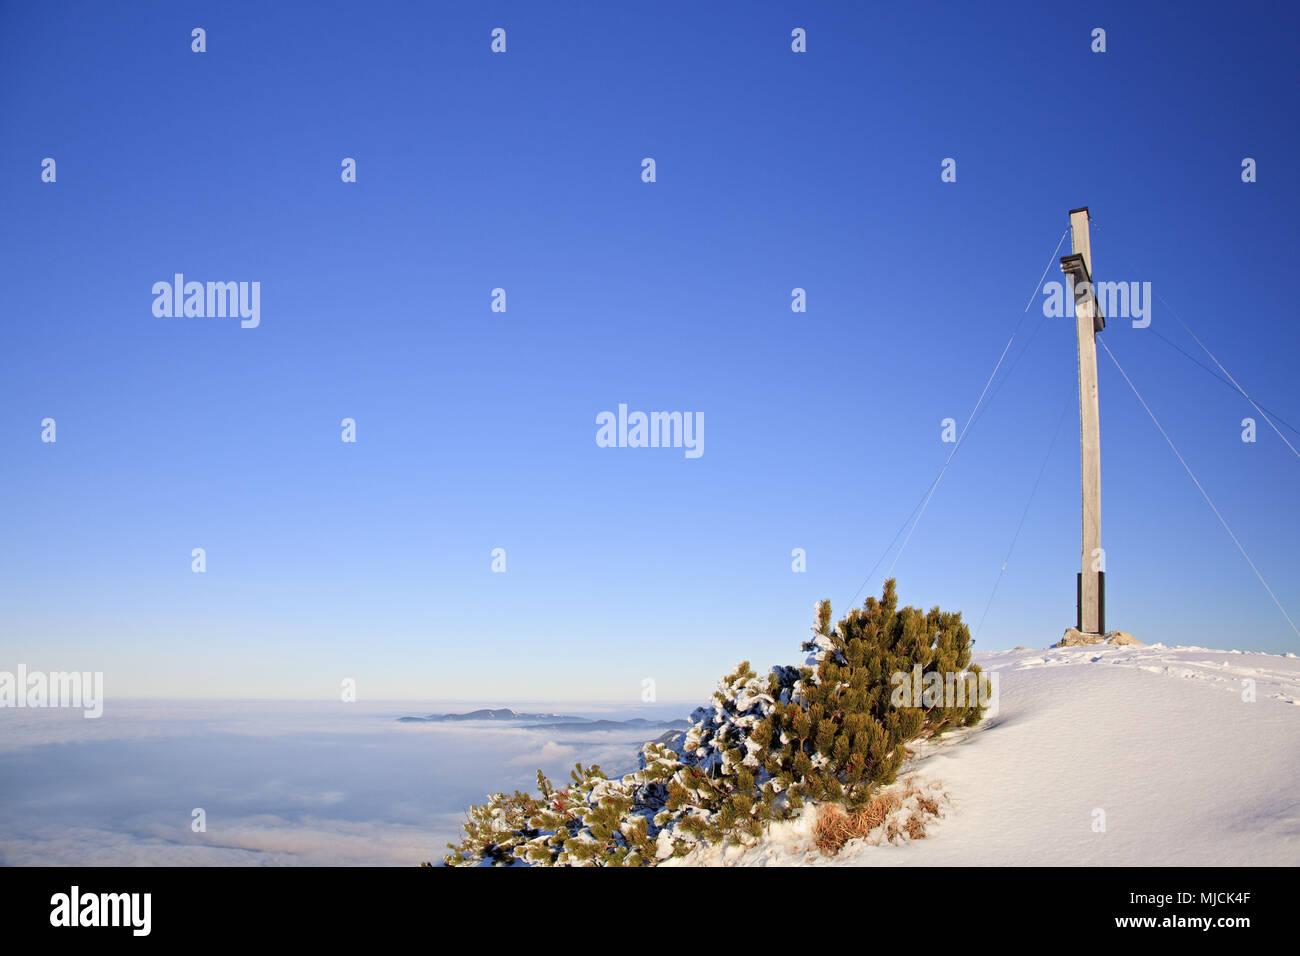 Summit cross on the Herzogstand, Bavarian Alpine Foreland, alps, Alpine foreland, Bavarian uplands, Upper Bavaria, Bavaria, South Germany, Germany, - Stock Image